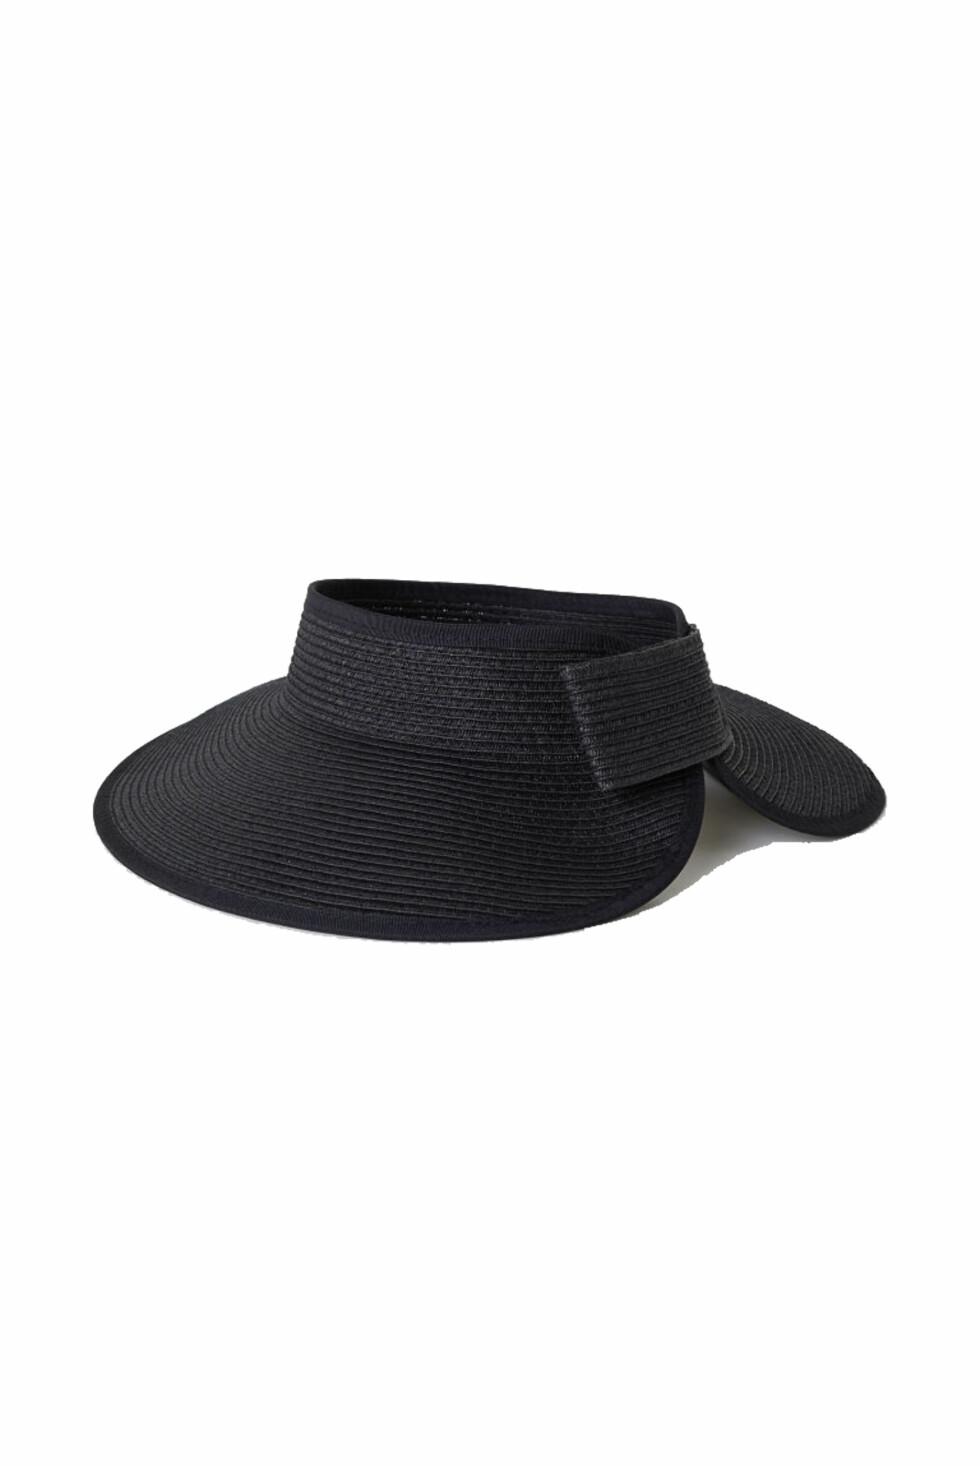 Hatt fra H&M |139,-| http://www2.hm.com/no_no/productpage.0583410001.html